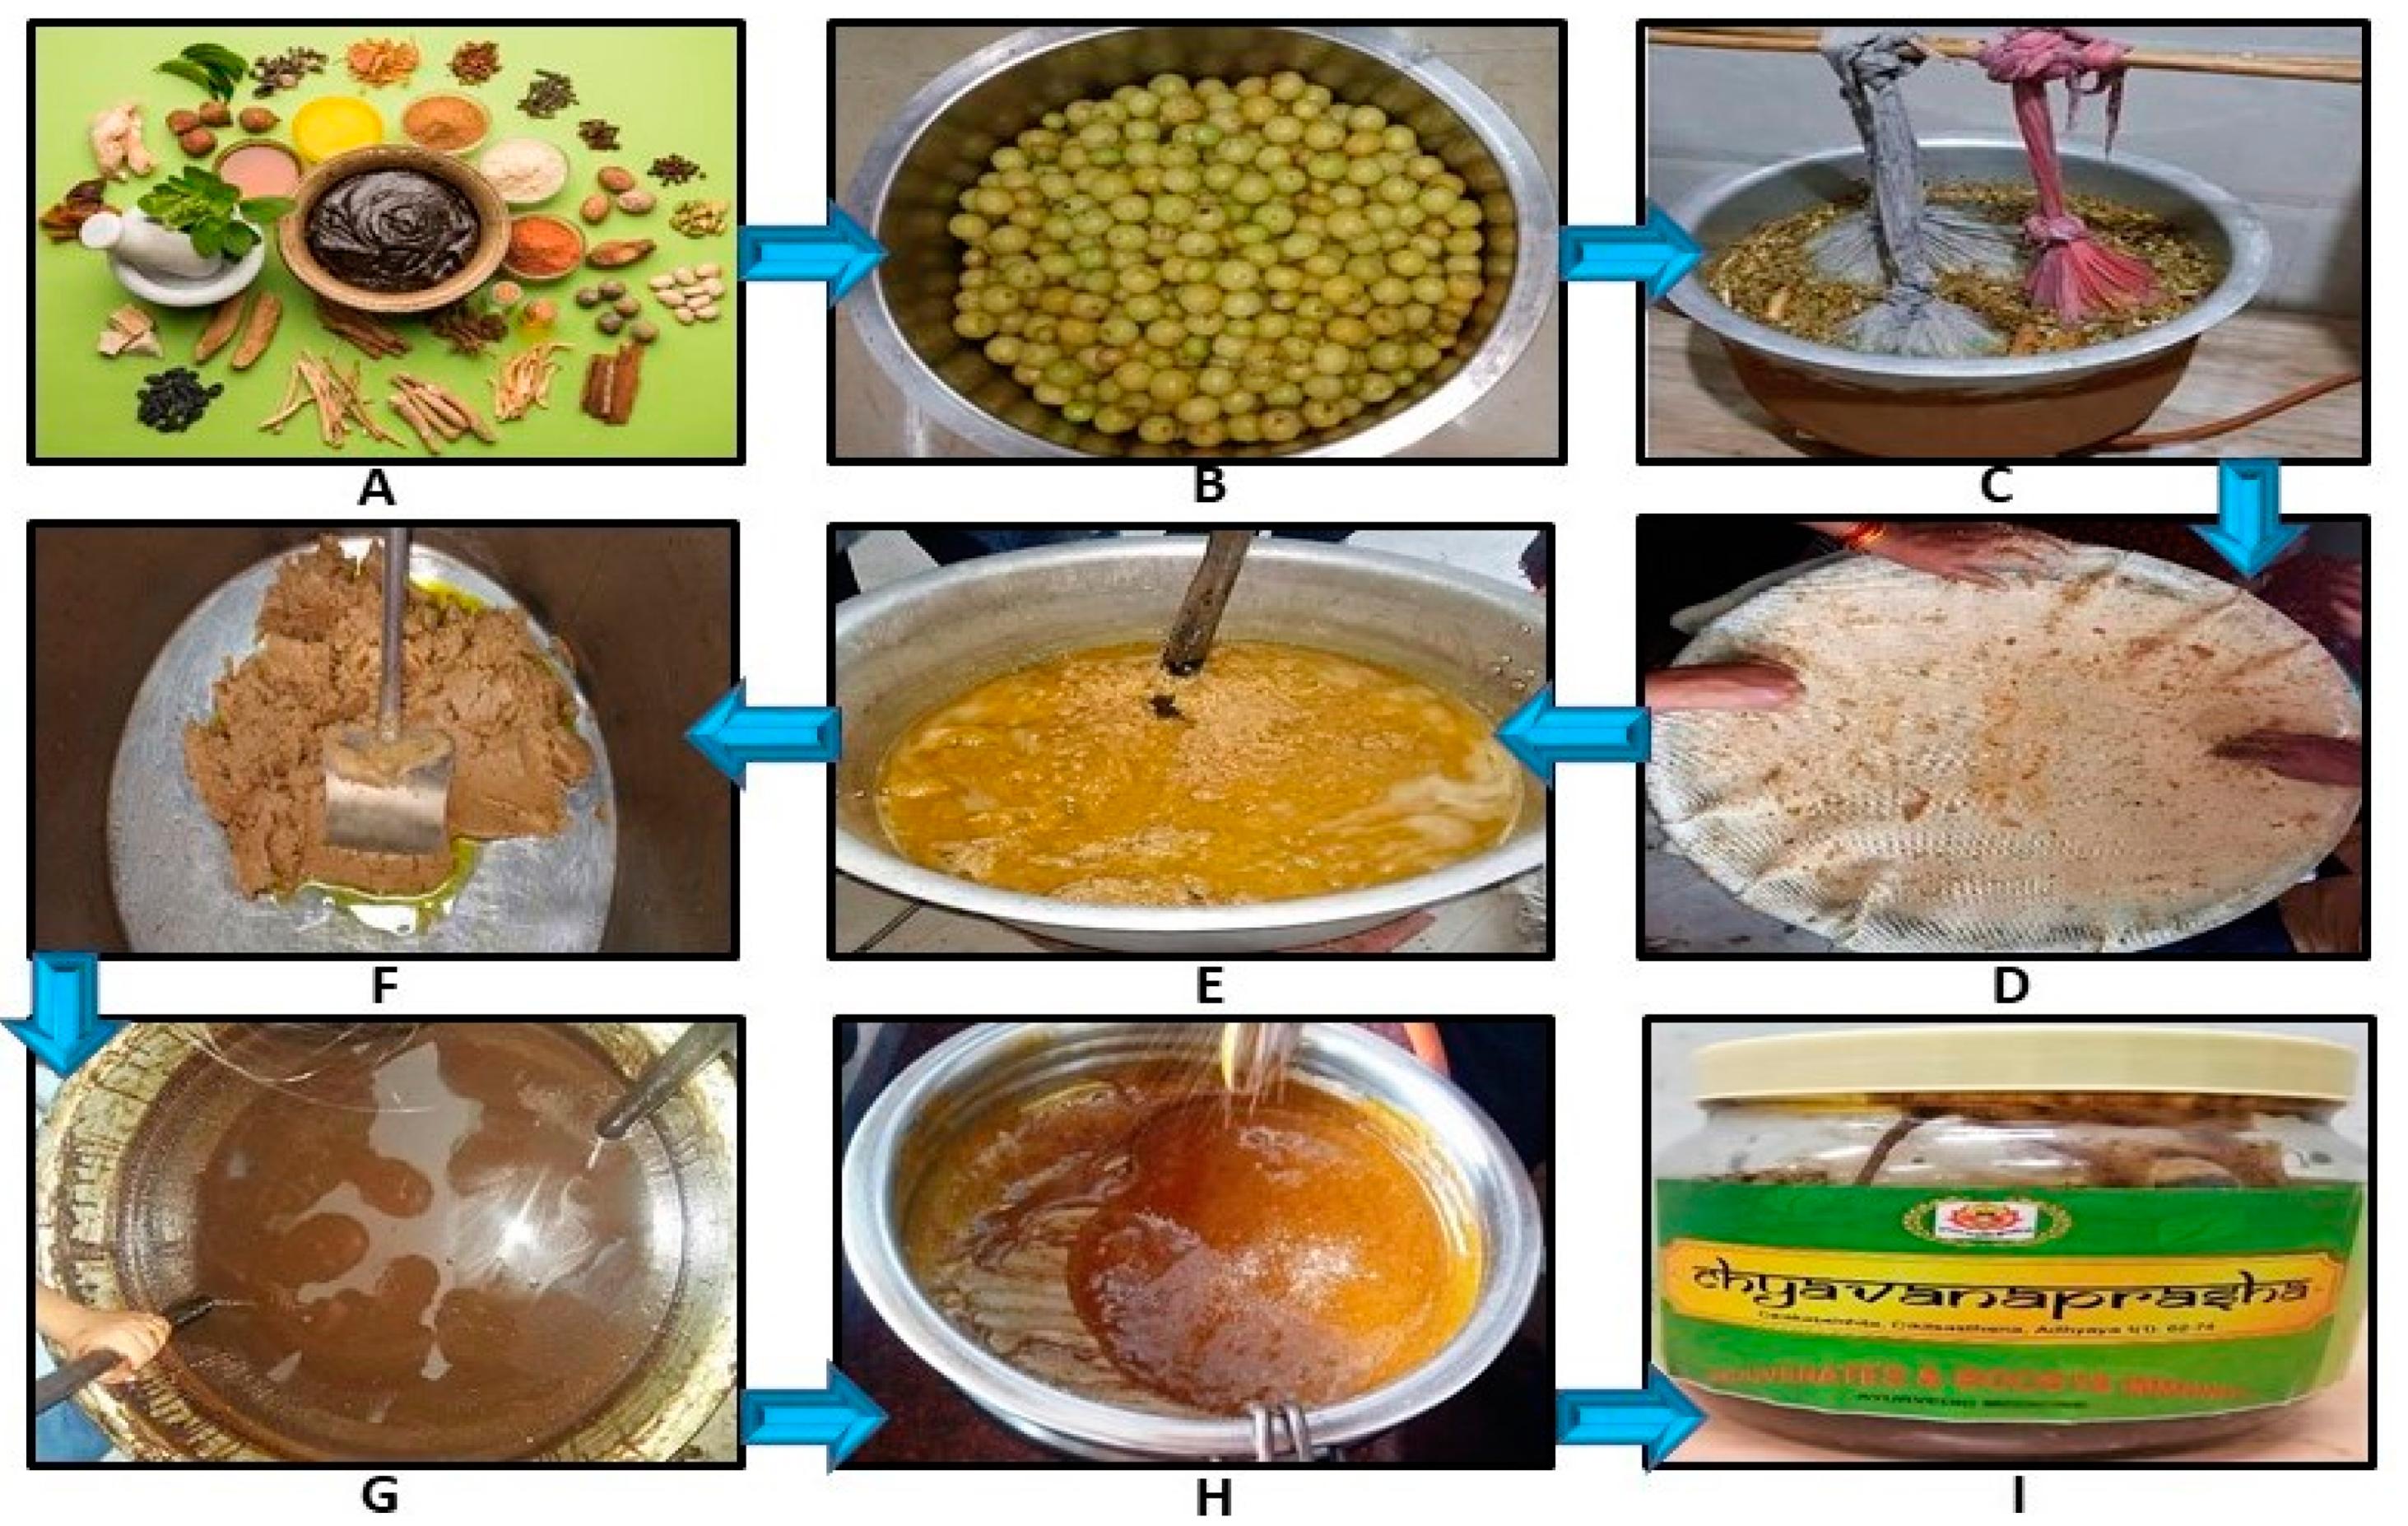 Biomolecules | Free Full-Text | Chyawanprash: A Traditional Indian